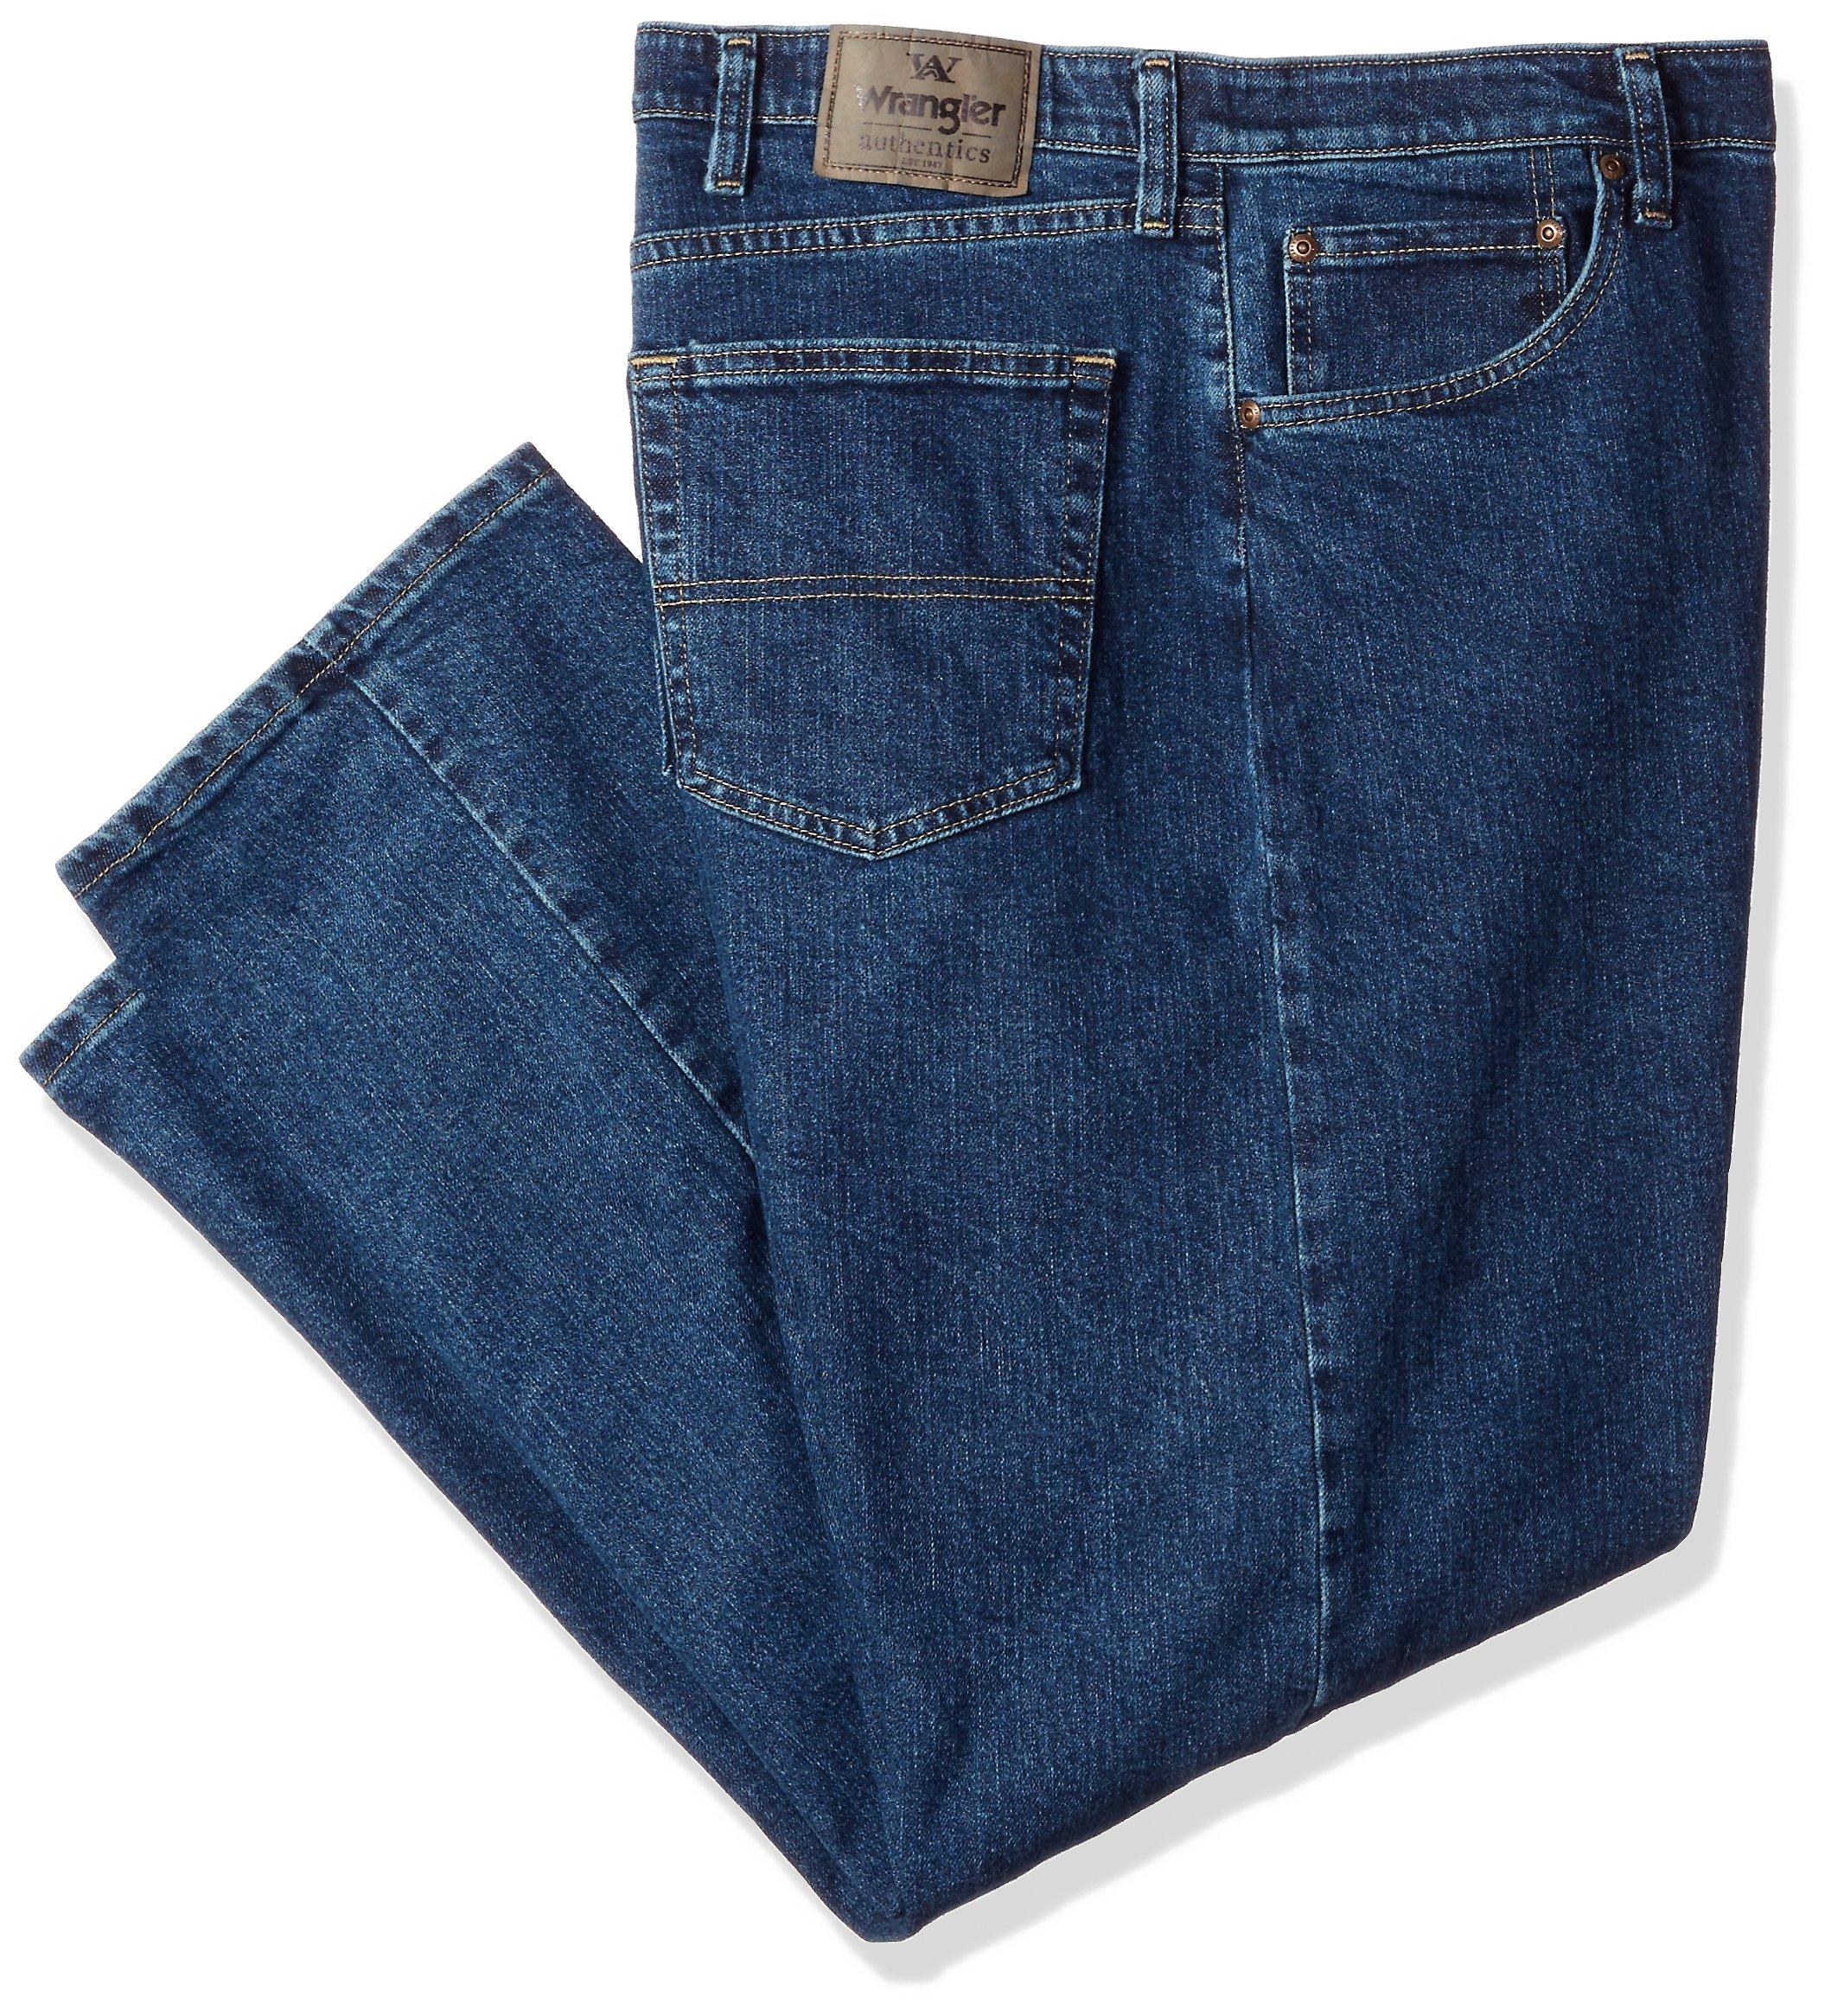 Wrangler Men's Big & Tall Regular Fit Comfort Flex Waist Jean, Dark Stonewash, 44X30